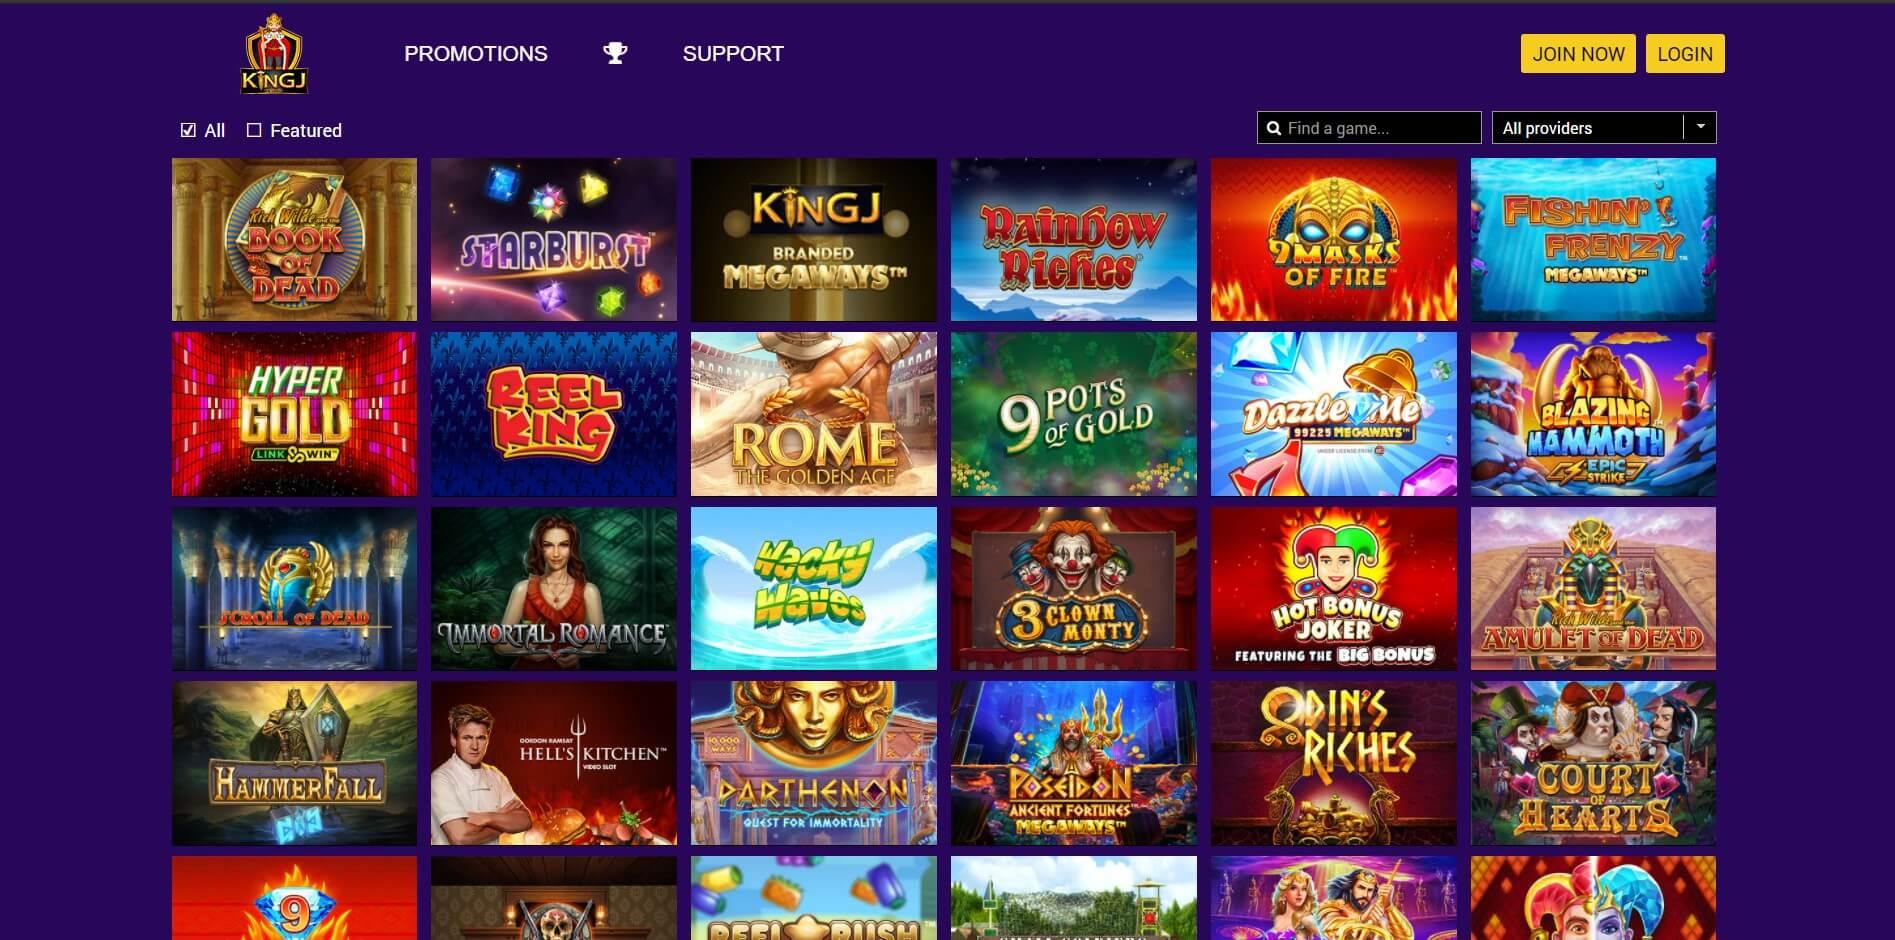 Games at KingJ Casino